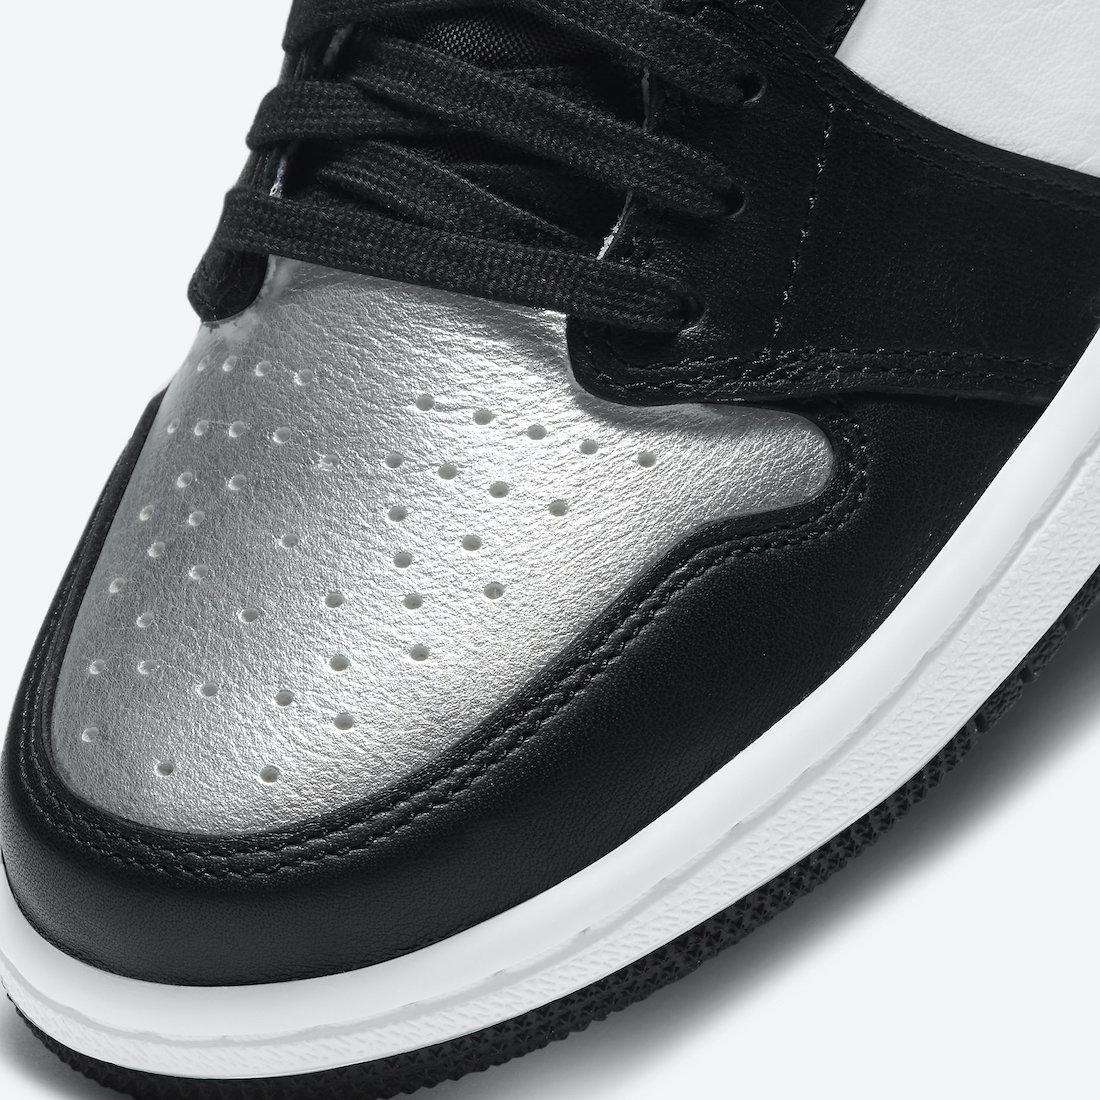 Air Jordan 1 High OG Silver Toe CD0461-001